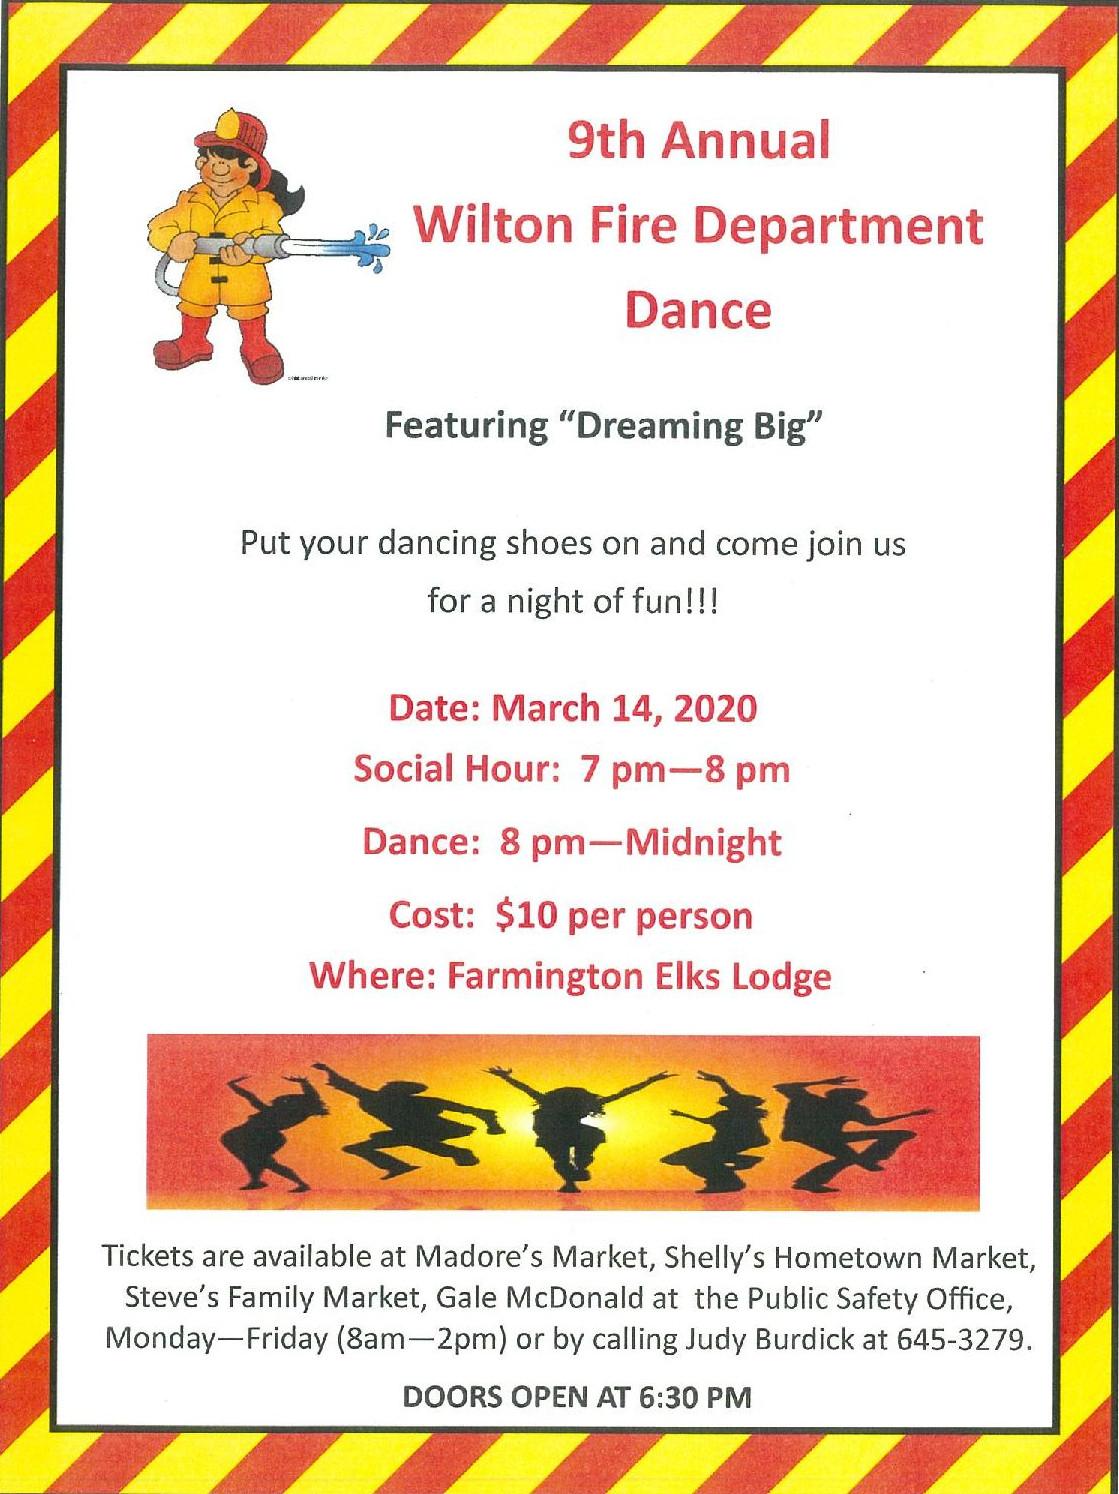 9th Annual Wilton Fire Department Dance